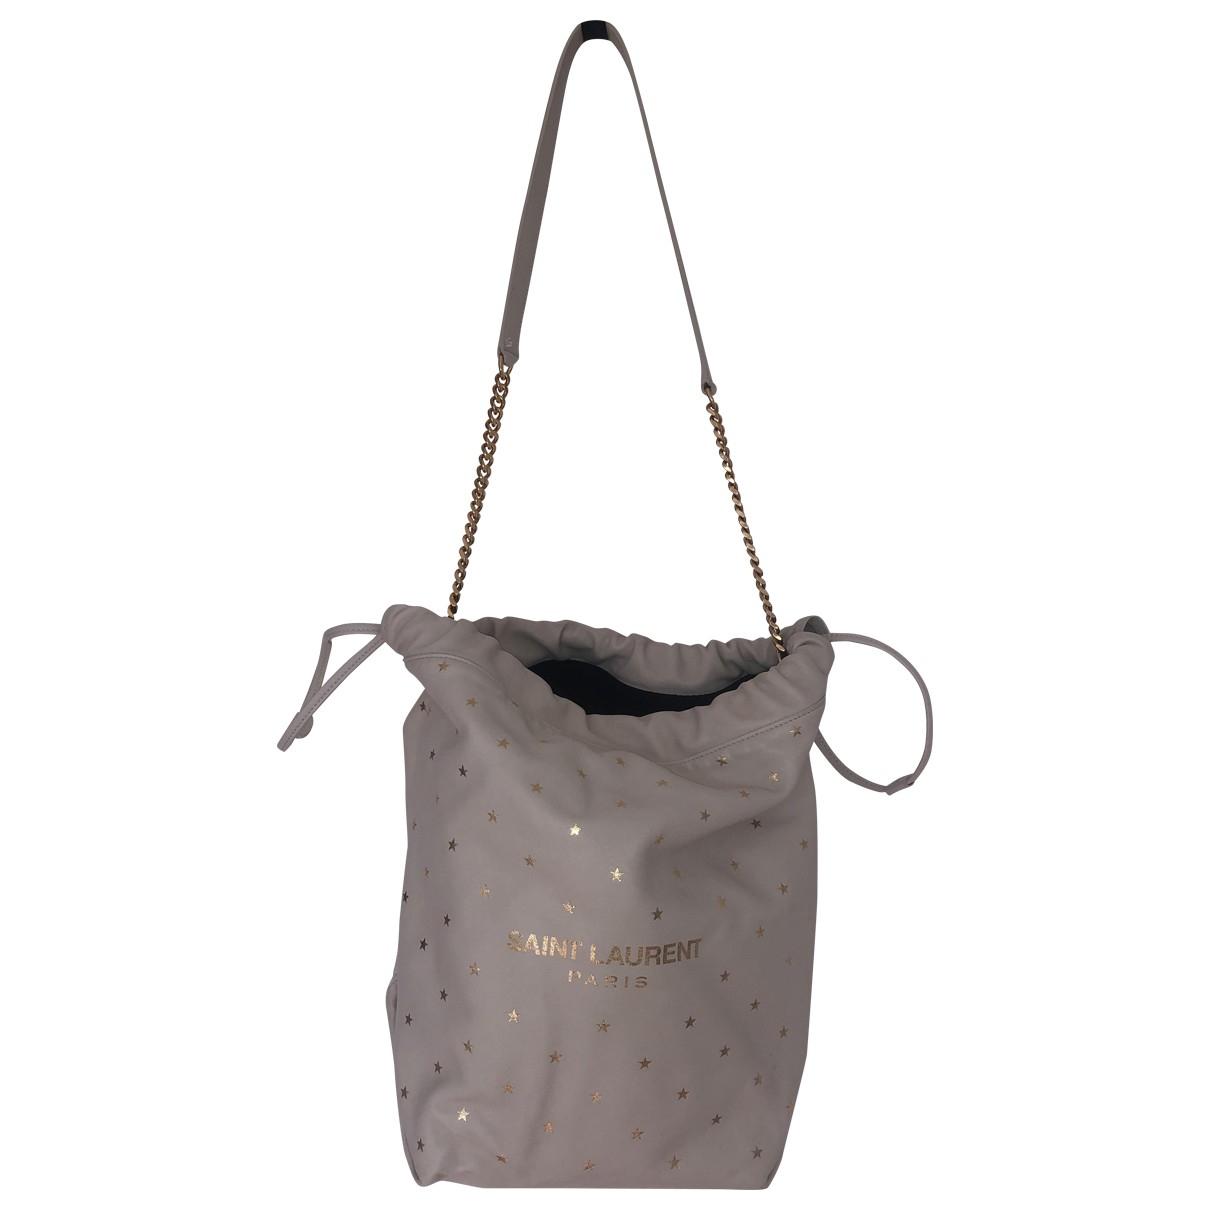 Saint Laurent Teddy Ecru Leather handbag for Women N